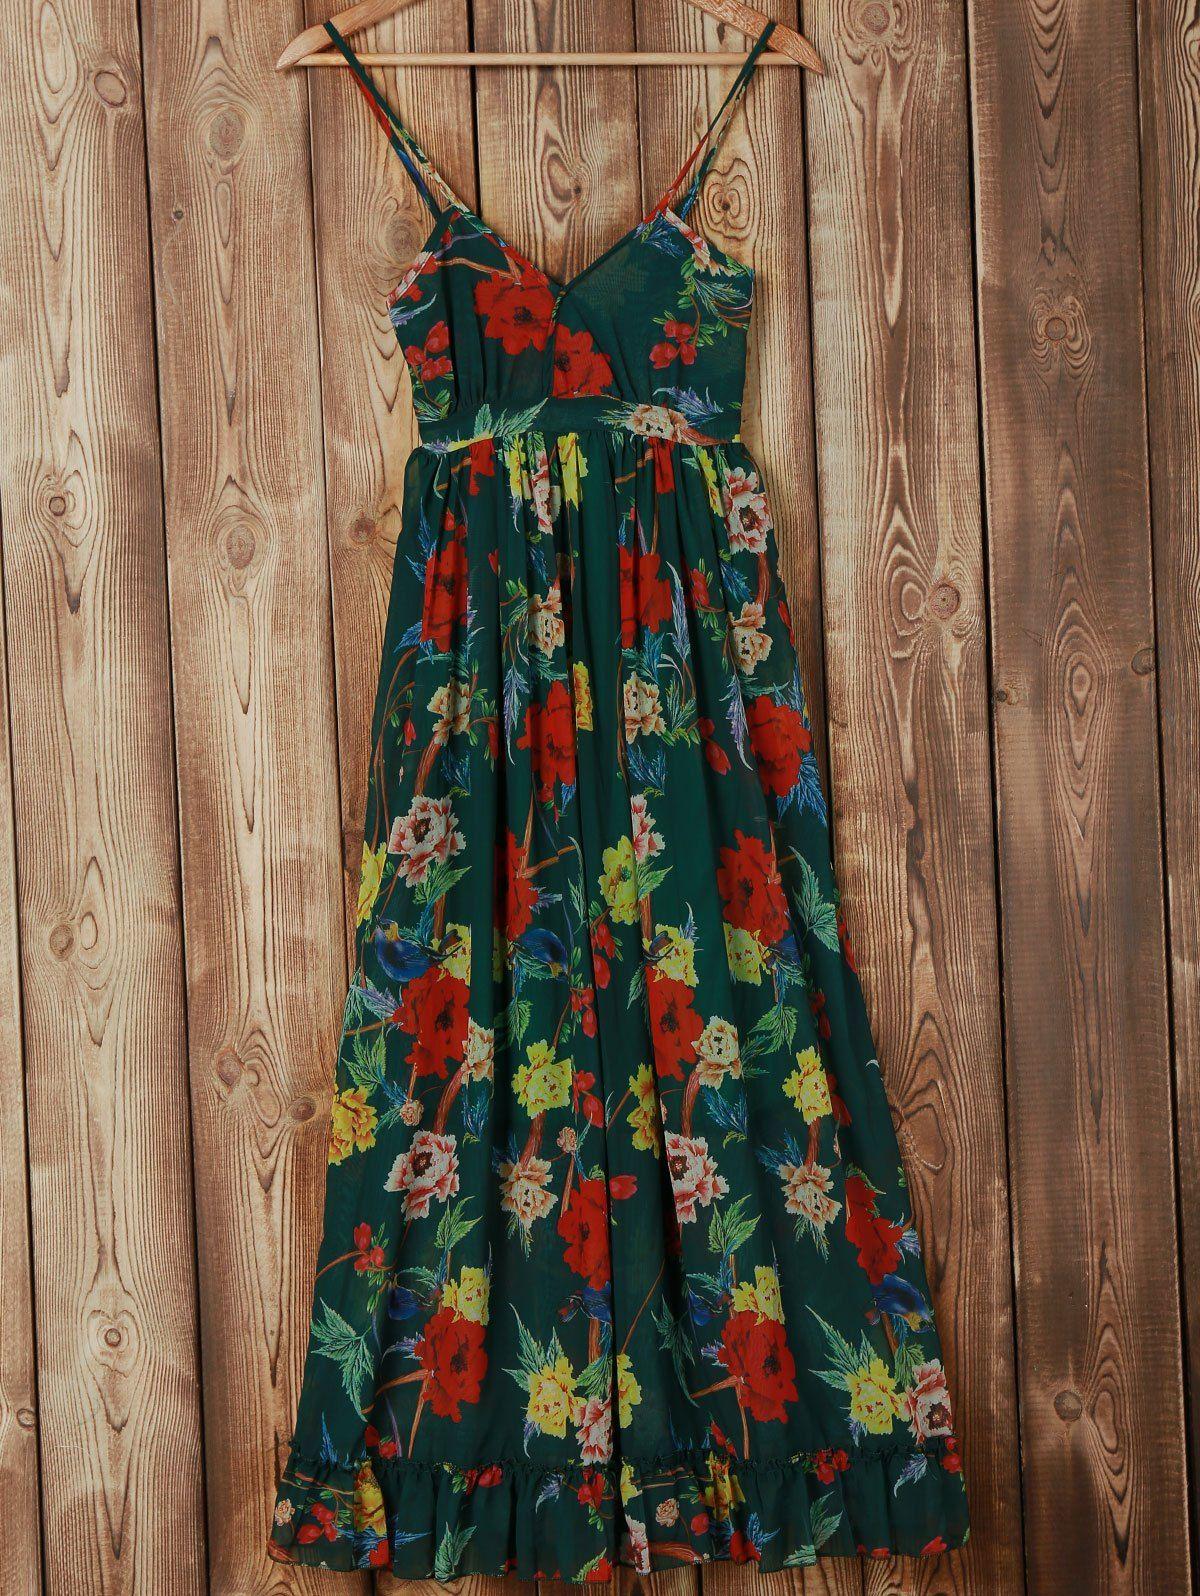 4ce19611cf6e1 Bohemian Spaghetti Strap Floral Print Women's Chiffon Dress #Teal #Red  #Multicolor #Floral #Maxi_Dresses #Summer_Dresses